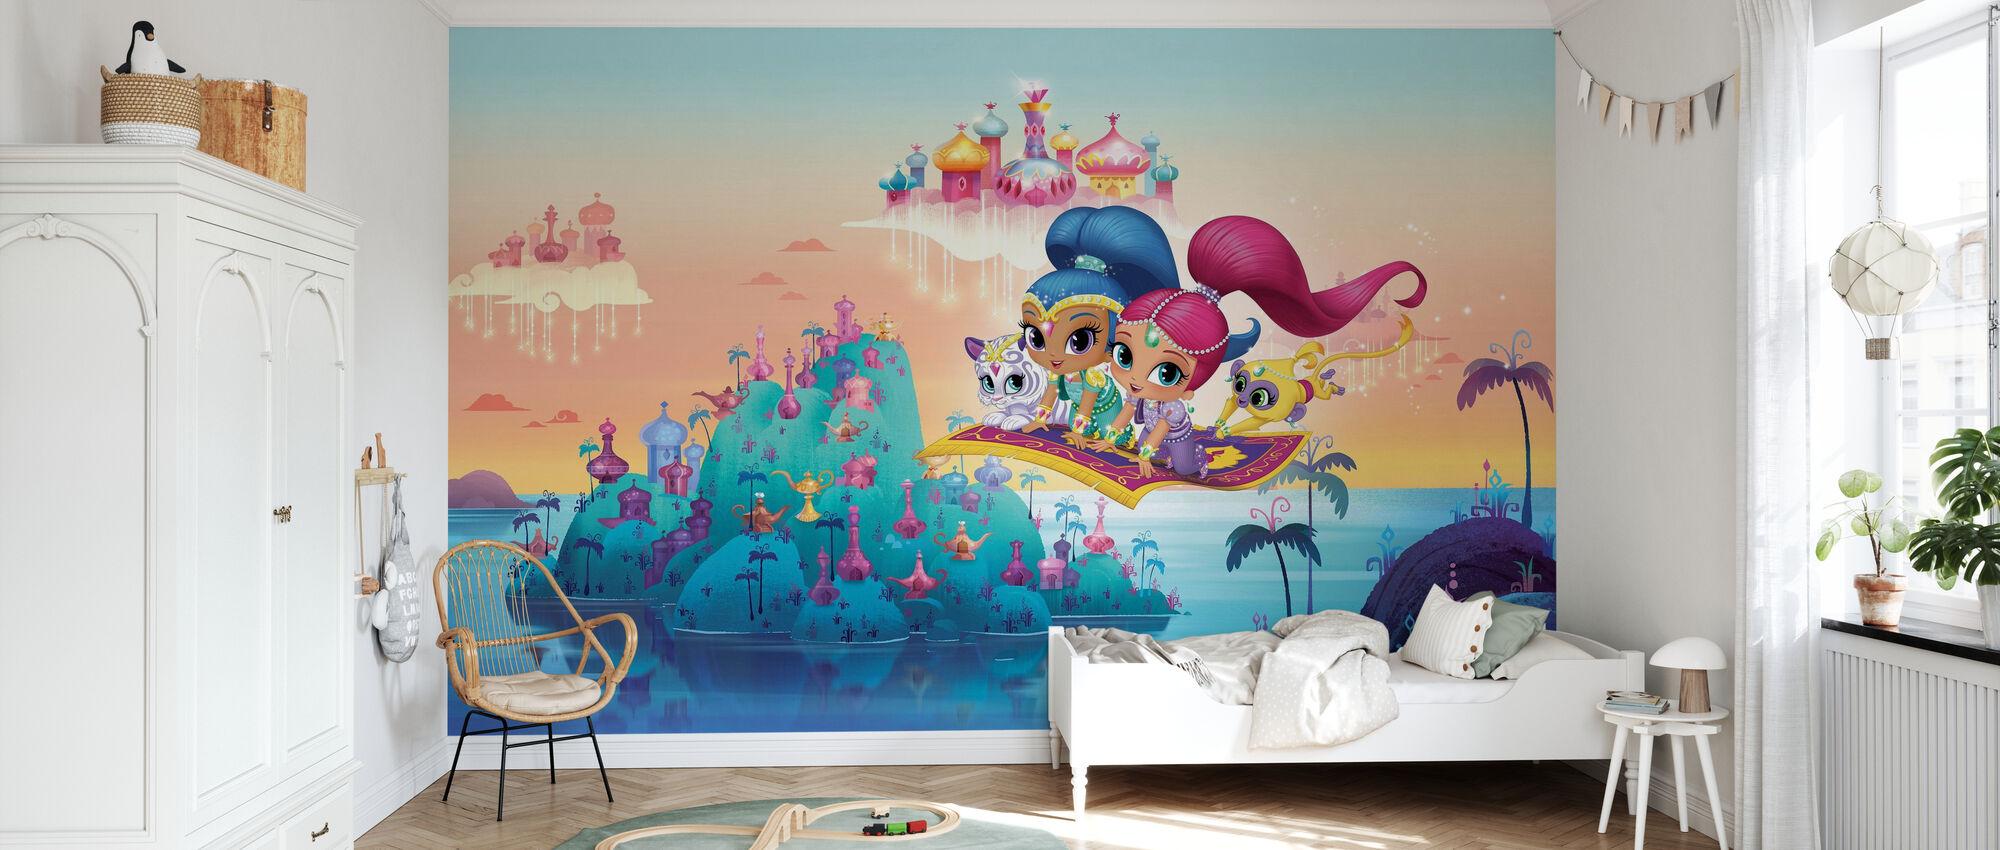 Zauberteppich Flug - Tapete - Kinderzimmer